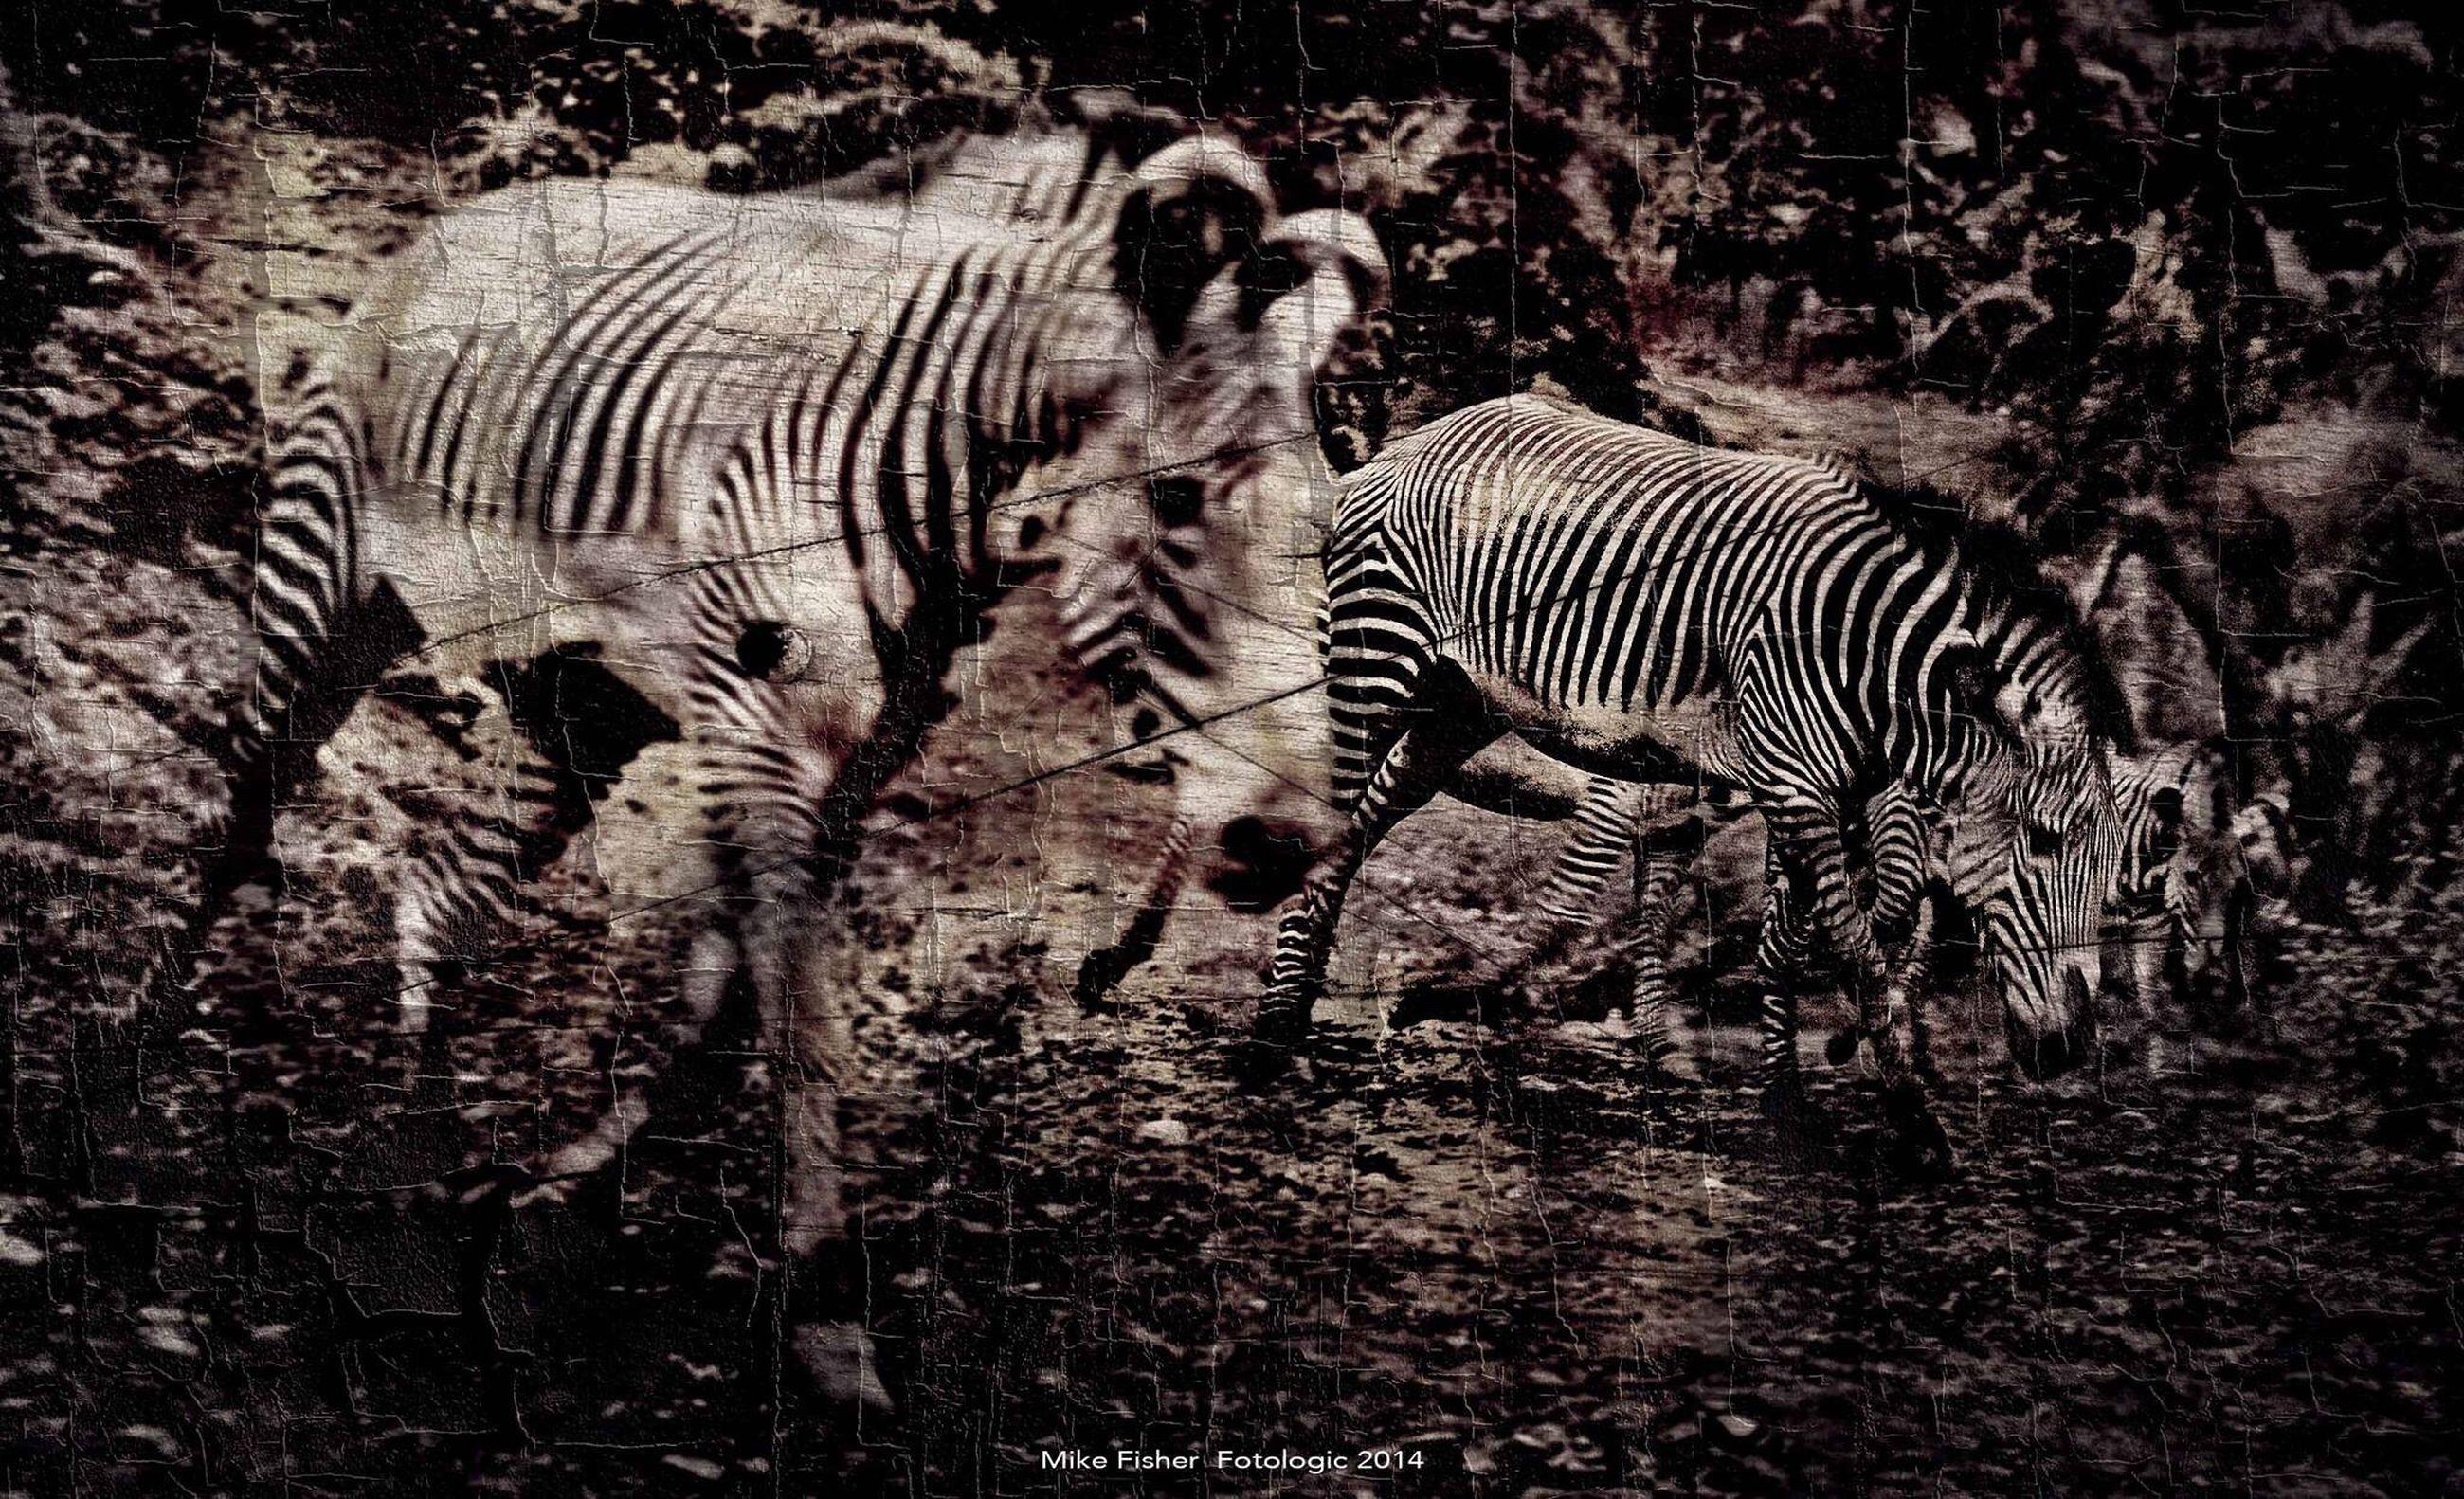 animal themes, animals in the wild, zebra, safari animals, wildlife, one animal, forest, striped, mammal, field, animal markings, nature, herbivorous, full length, two animals, giraffe, zoo, outdoors, standing, no people